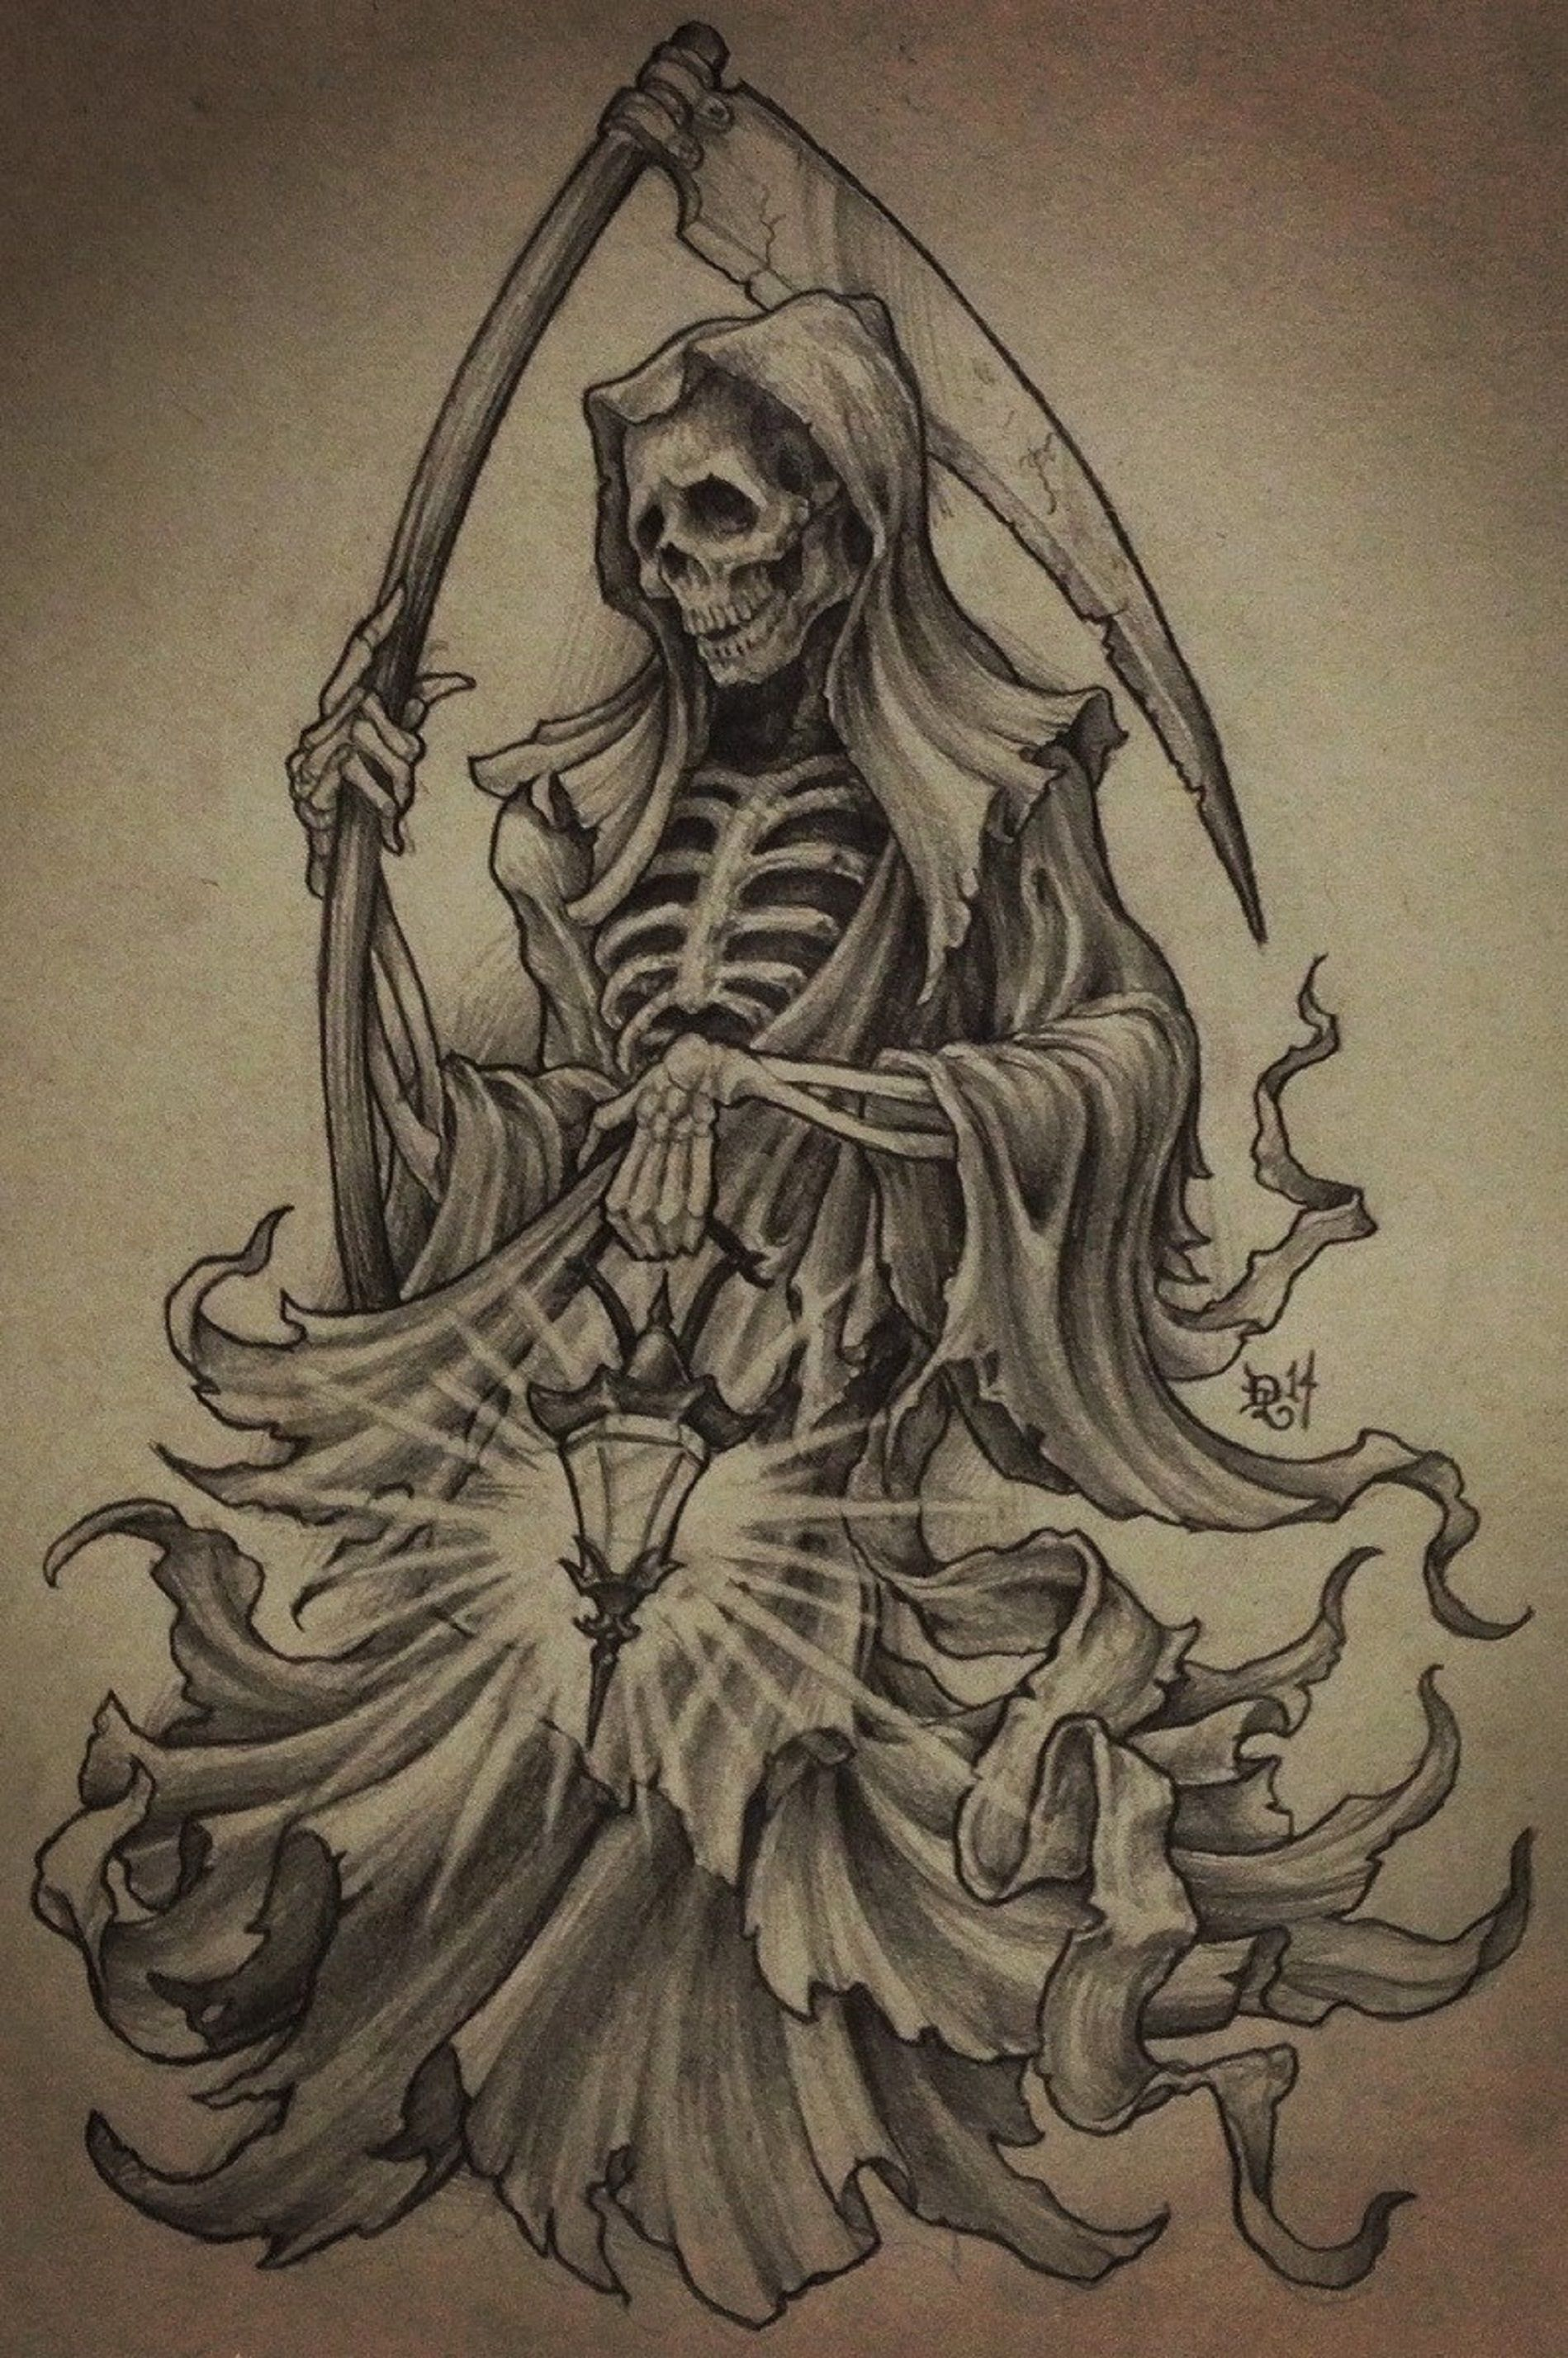 grim reaper art reaper drawing reaper tattoo body